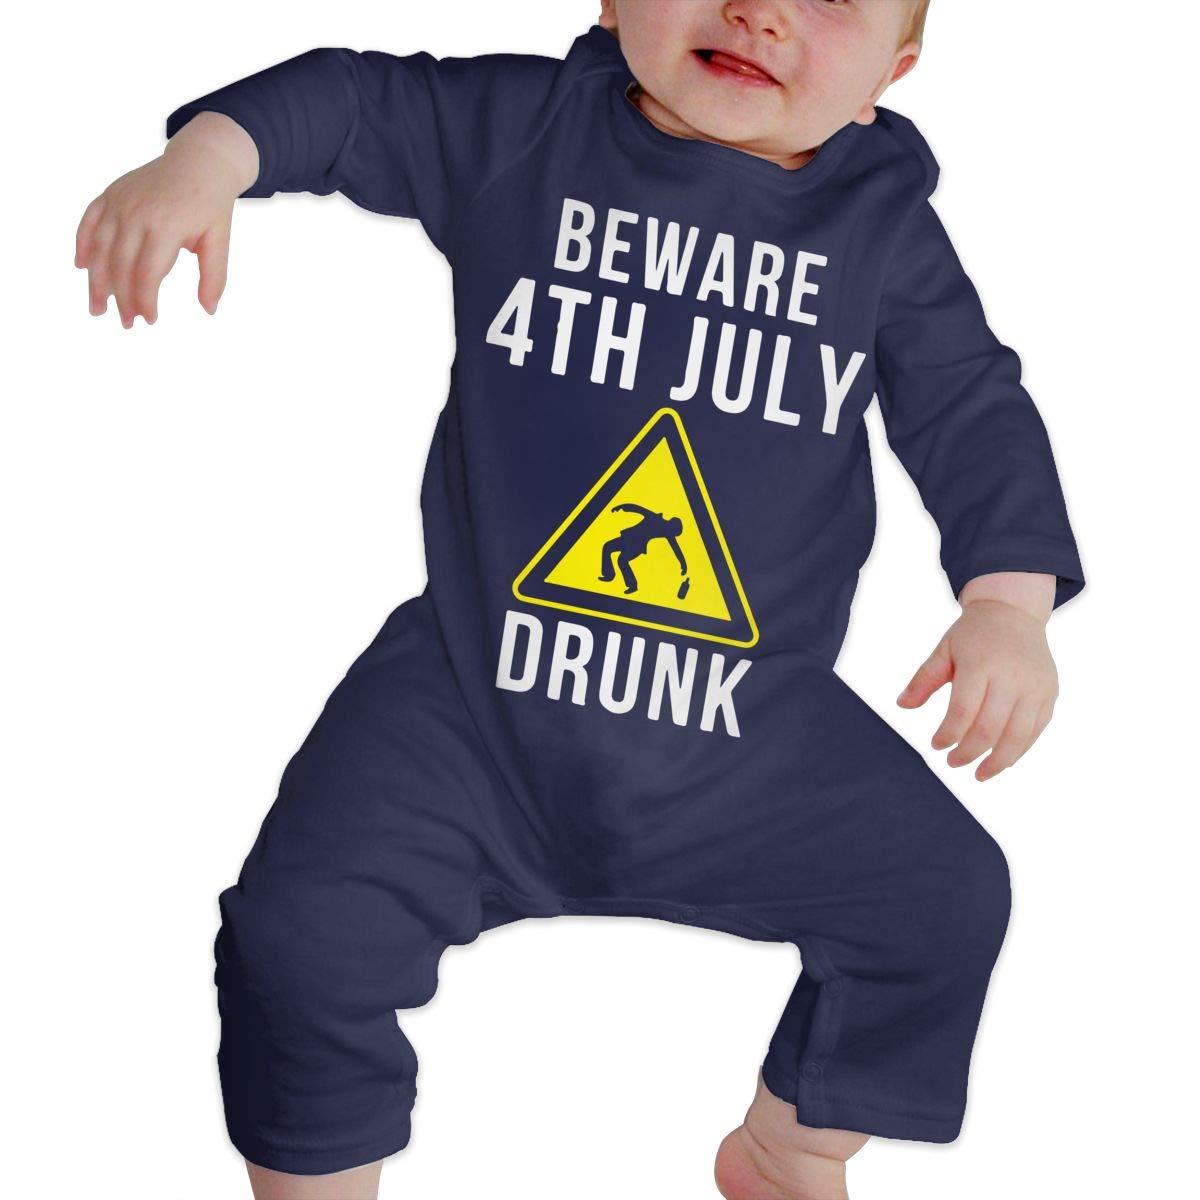 LBJQ8 Beware 4th July Drunk Newborn Infant Baby Girls Organic Cotton Romper Pajama Clothes